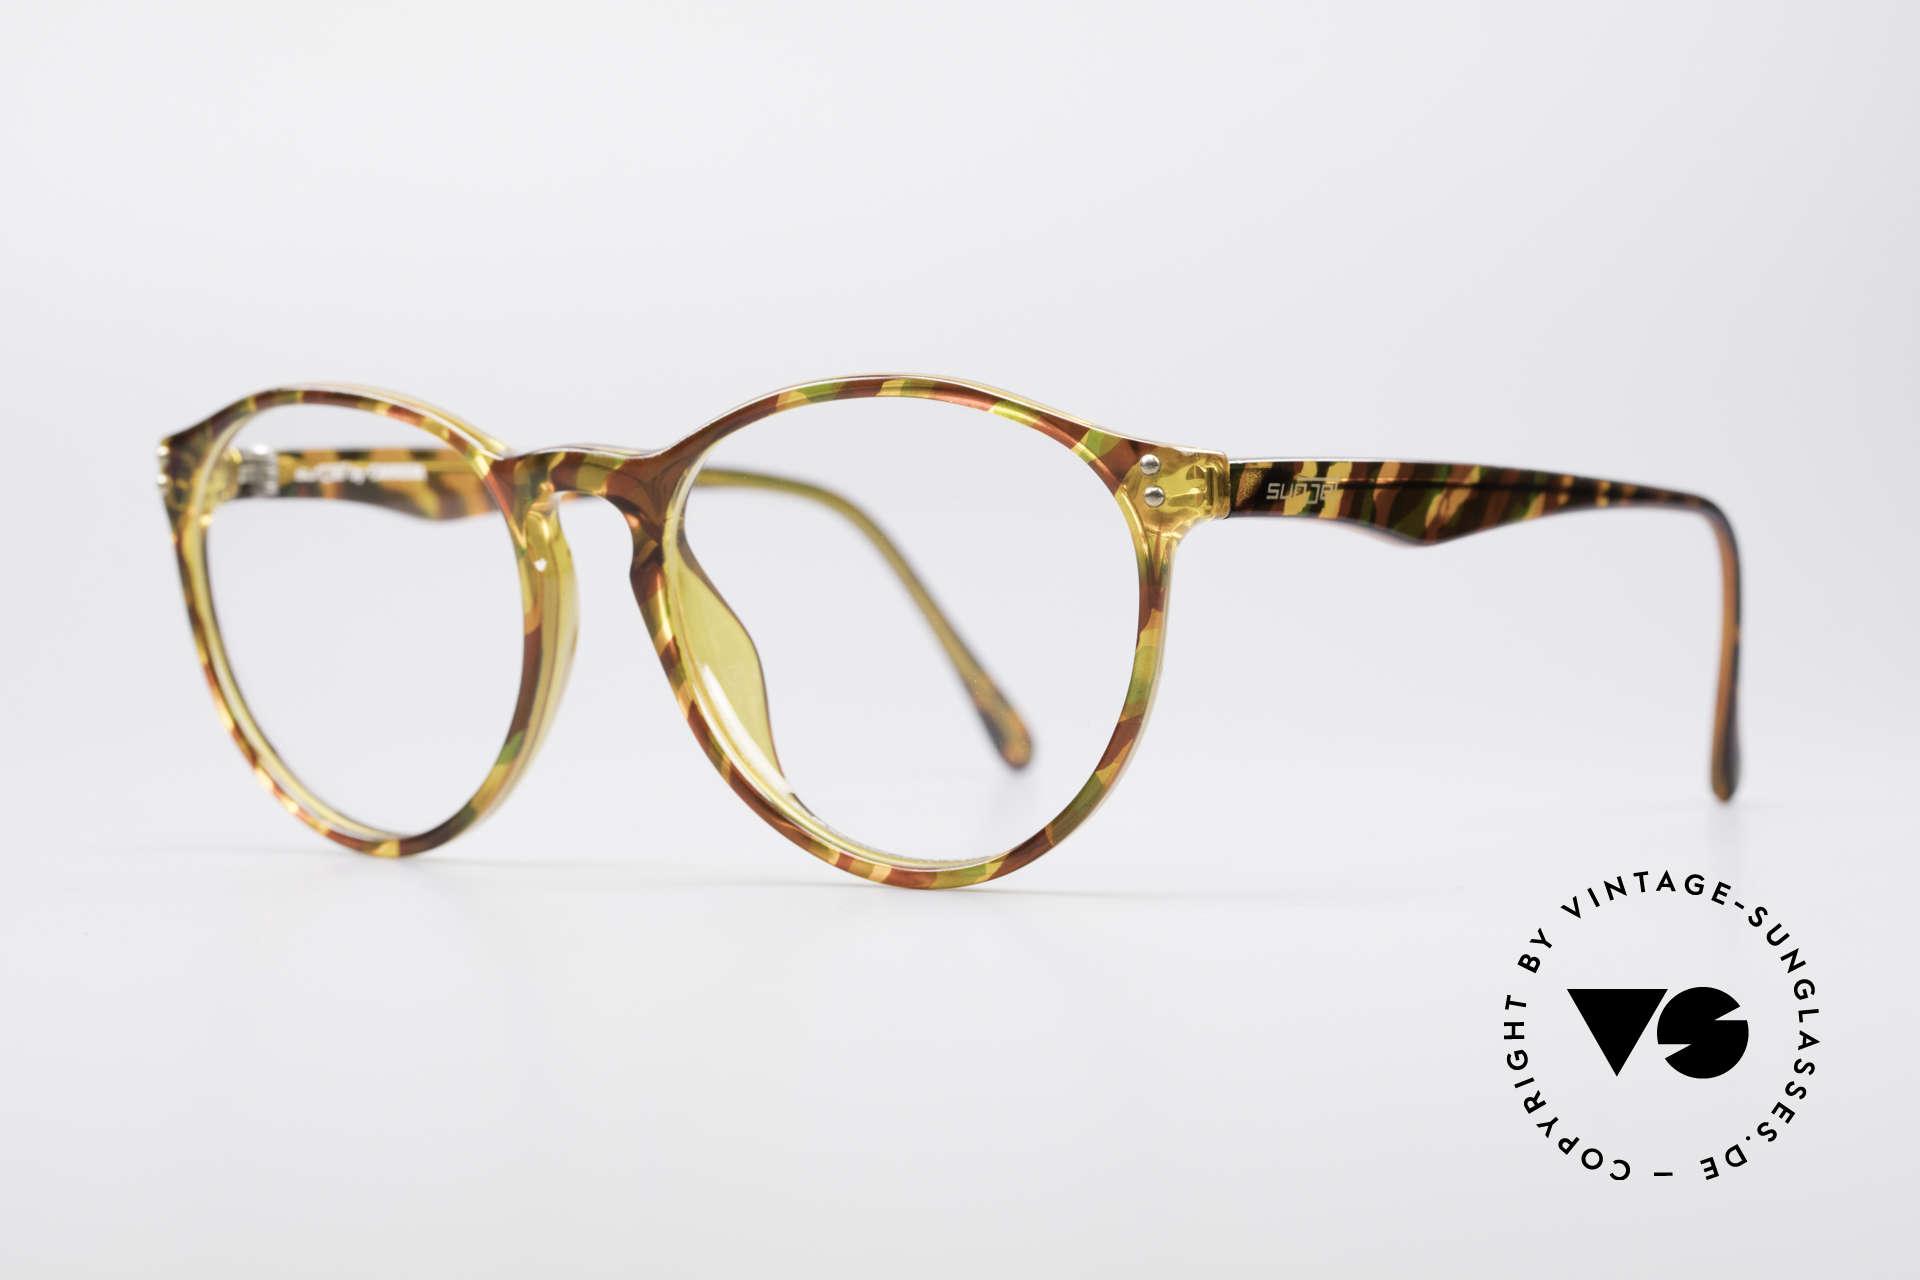 Carrera 5282 90's Panto Eyeglasses, inspired by the old 60's 'Tart Optical Arnel' frames, Made for Men and Women